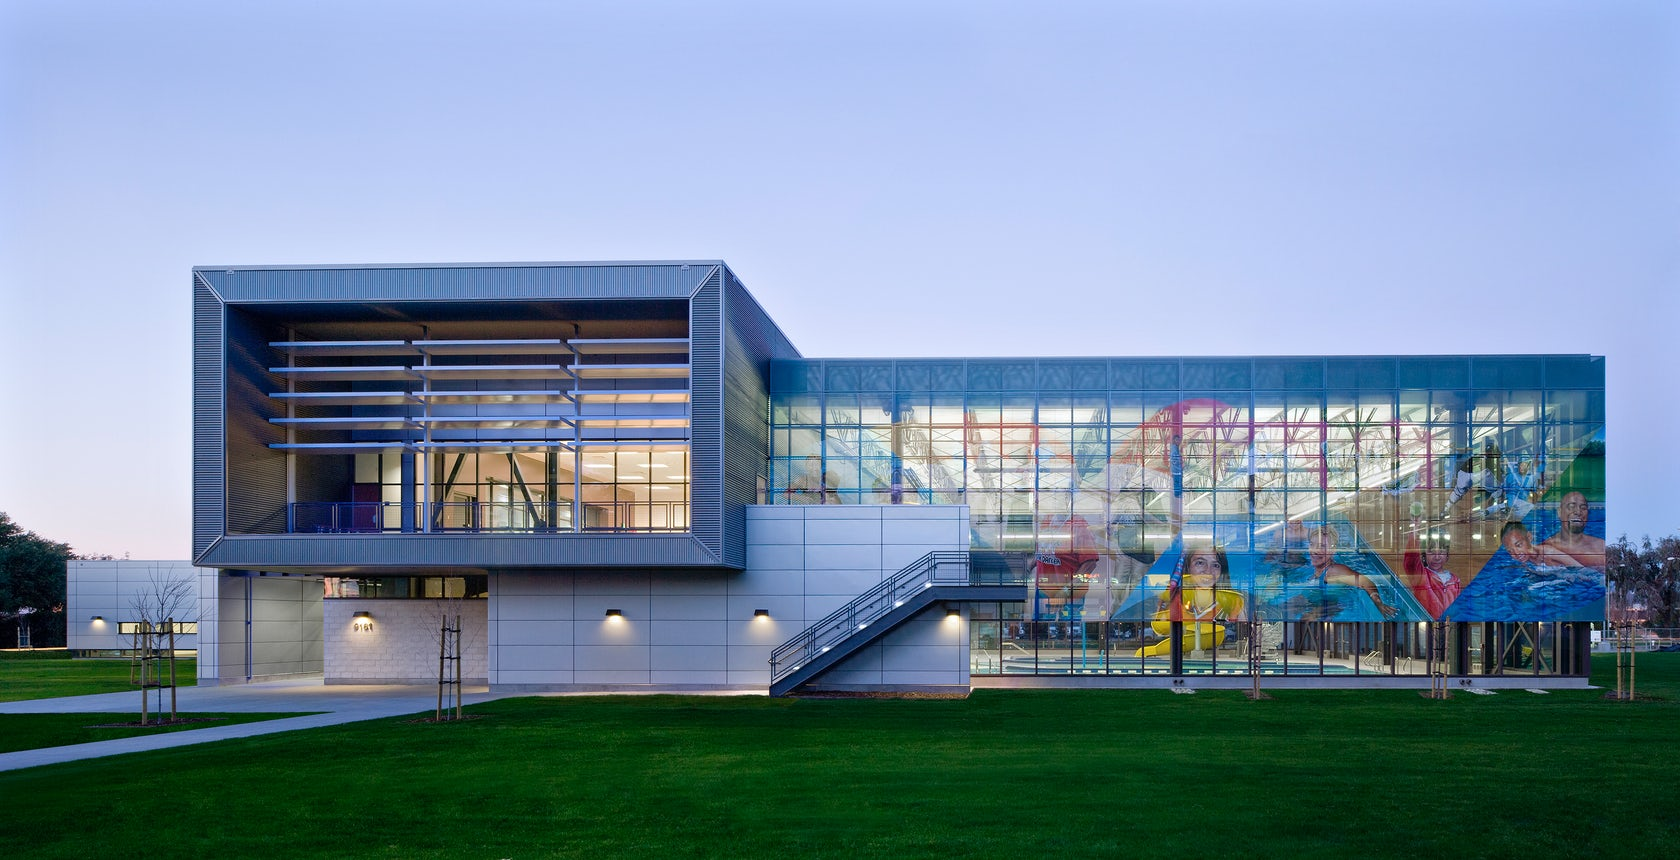 East oakland sport center architizer - Oakland community college interior design ...